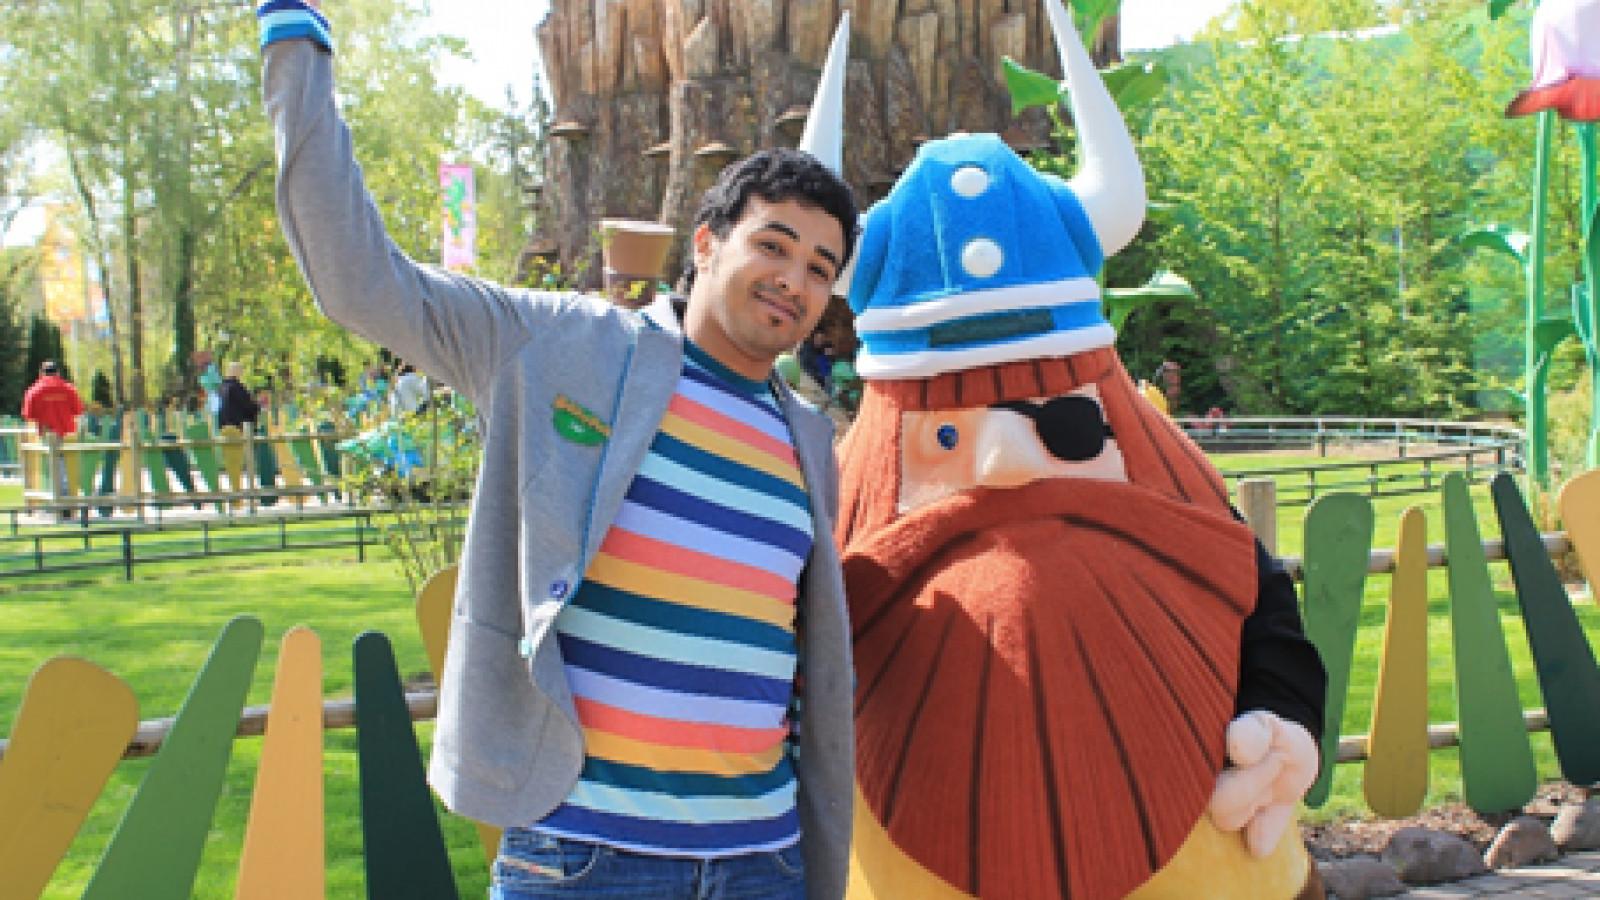 Über 600 Jobangebote im Holiday Park